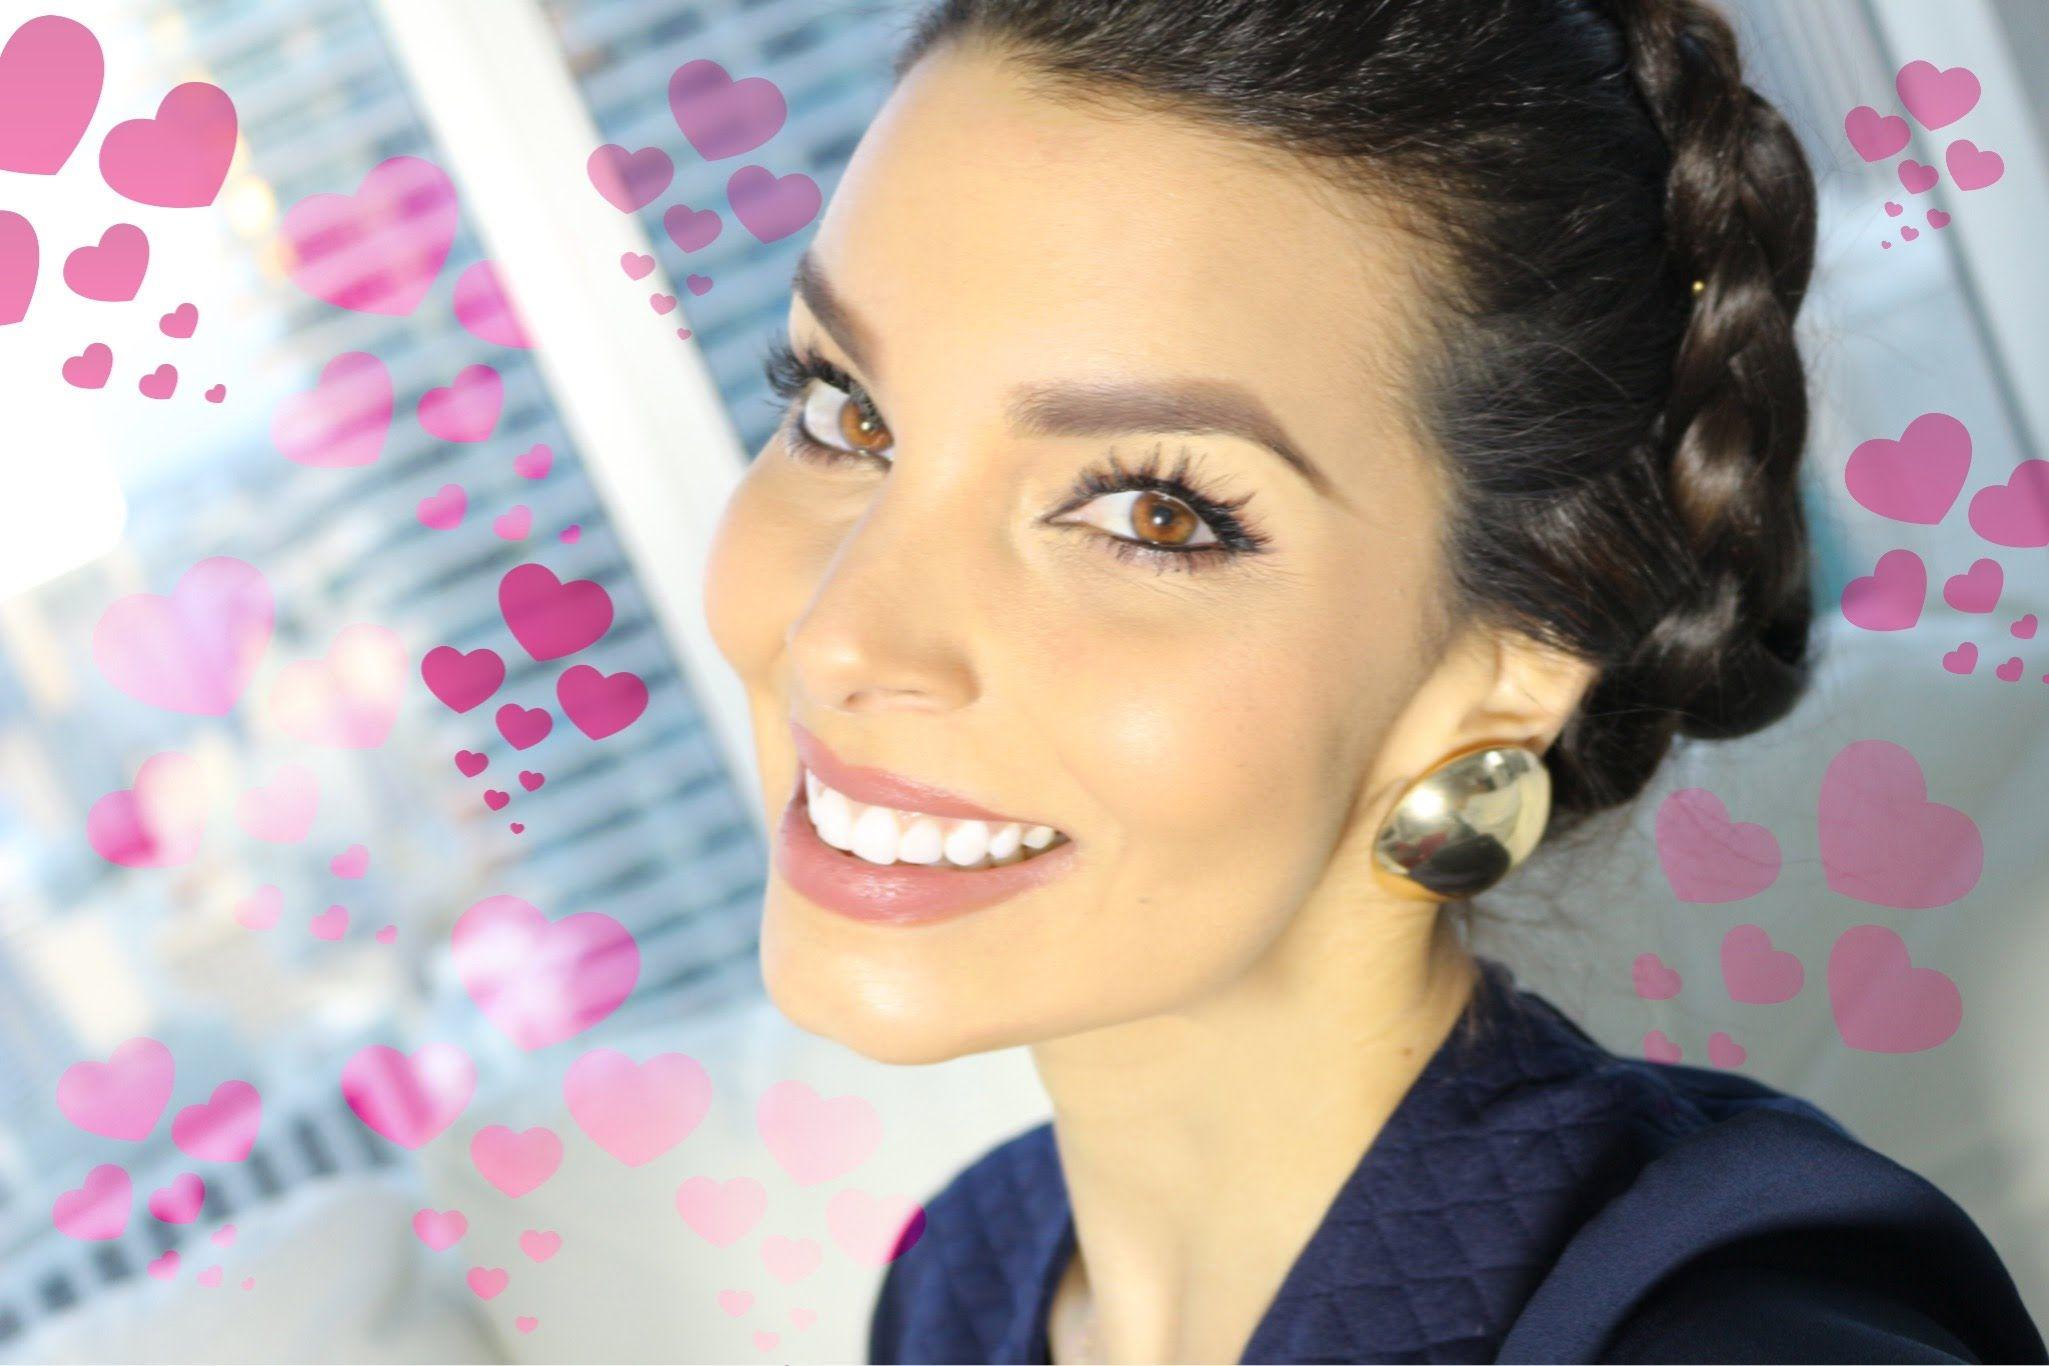 Corona De Trenzas Peinado Romantico Para San Valentin Para - Peinados-romanticos-con-trenzas